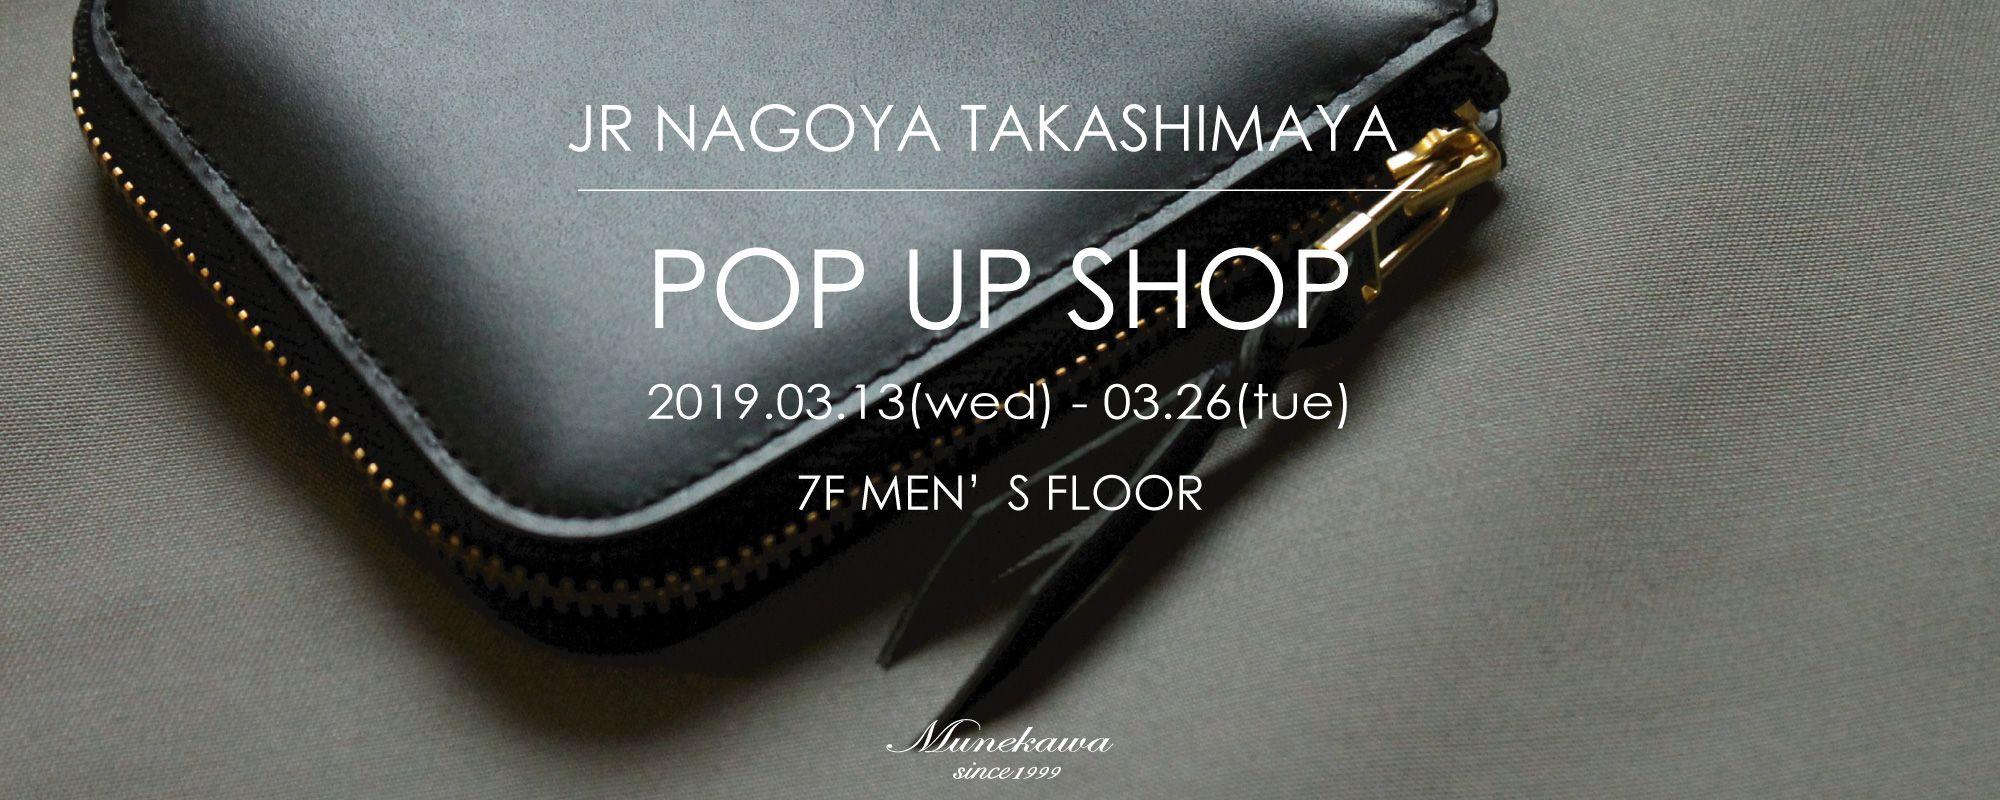 Munekawa期間限定POP UP SHOP 名古屋高島屋